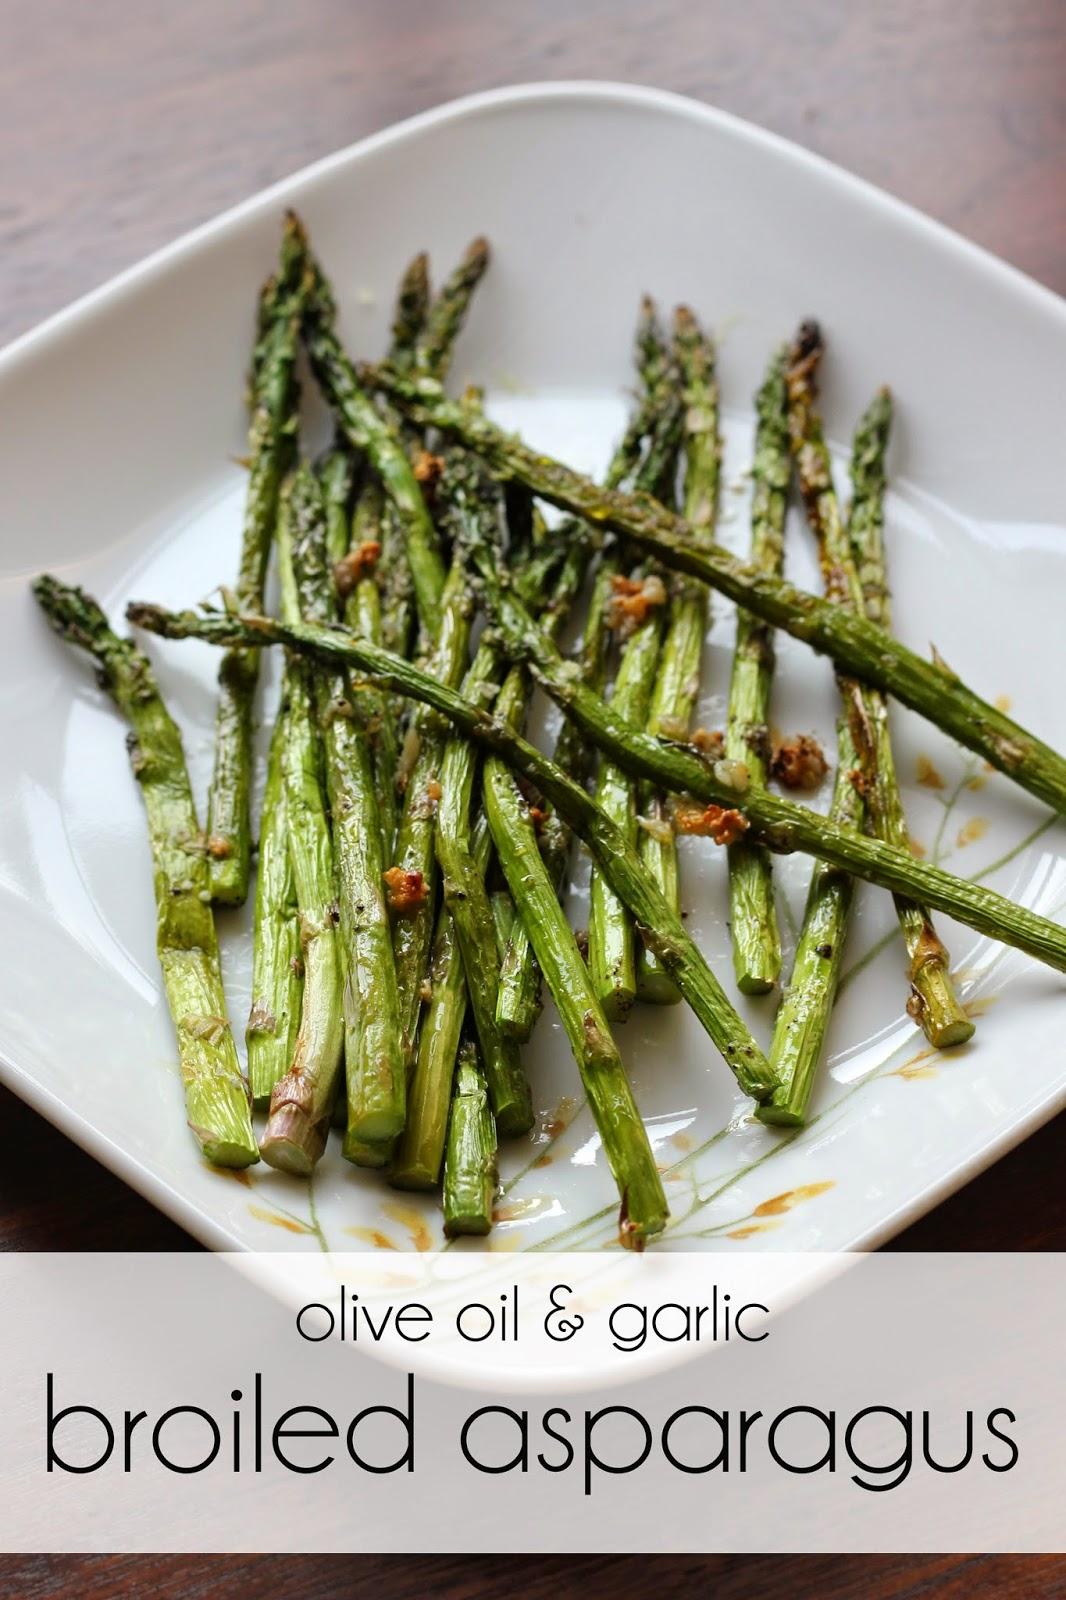 broiled-asparagus-garlic-olive-oil